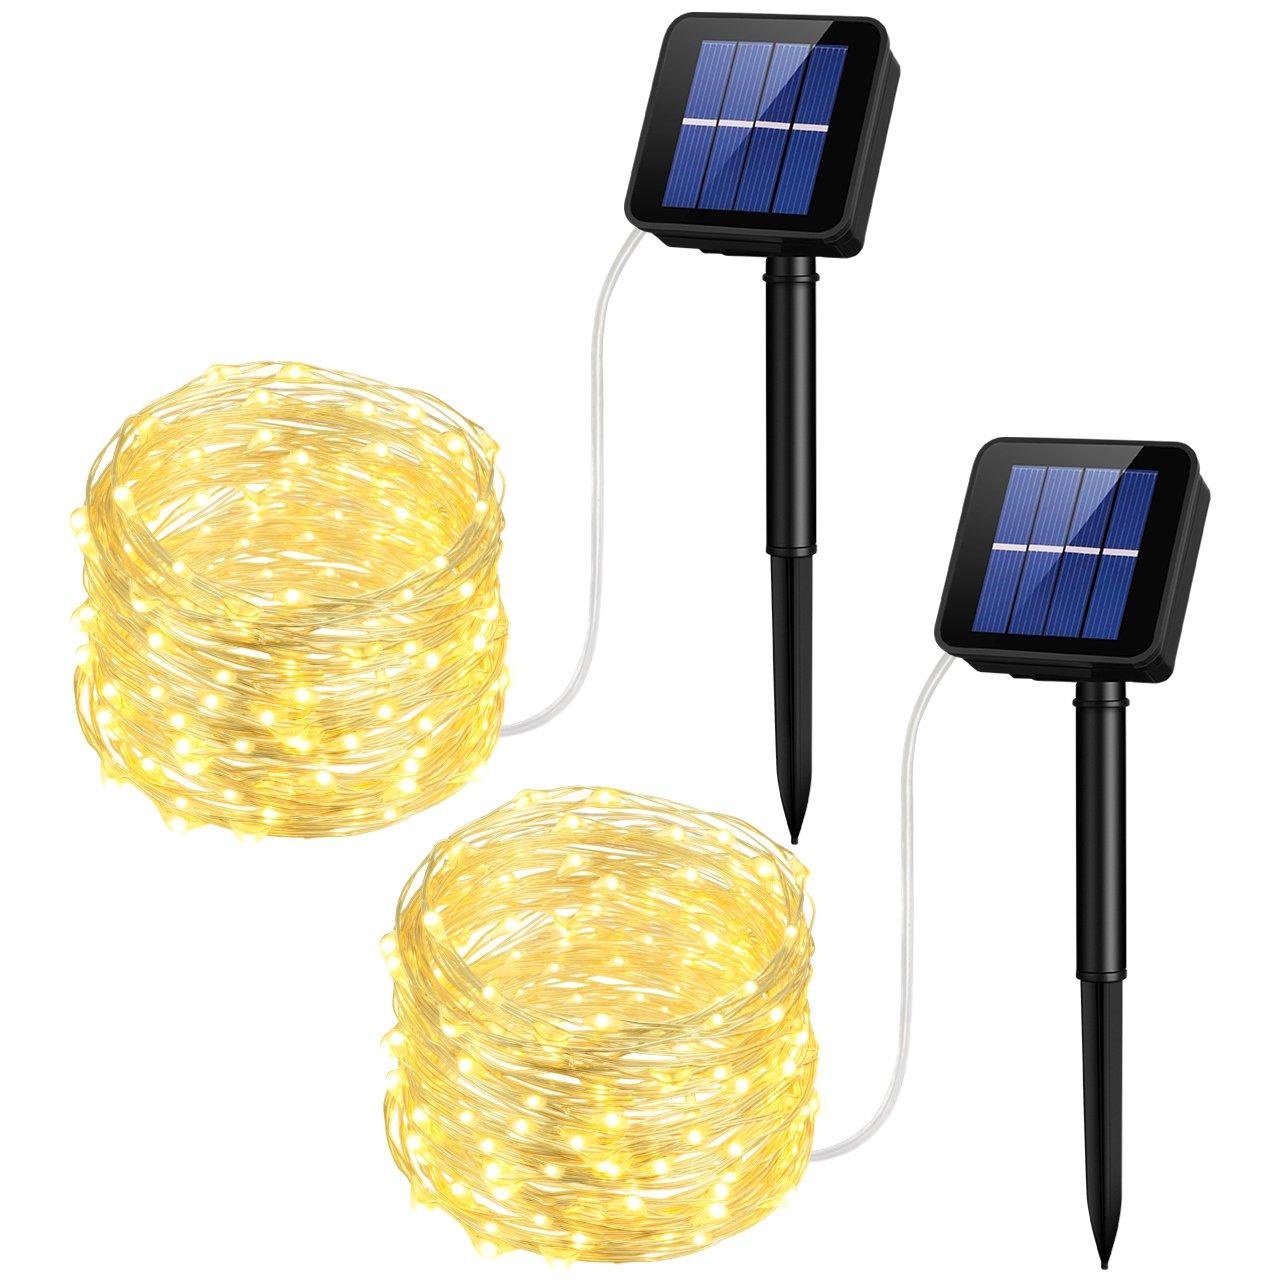 galleon mpow solar string lights 33ft 100led outdoor string lights waterproof decorative. Black Bedroom Furniture Sets. Home Design Ideas